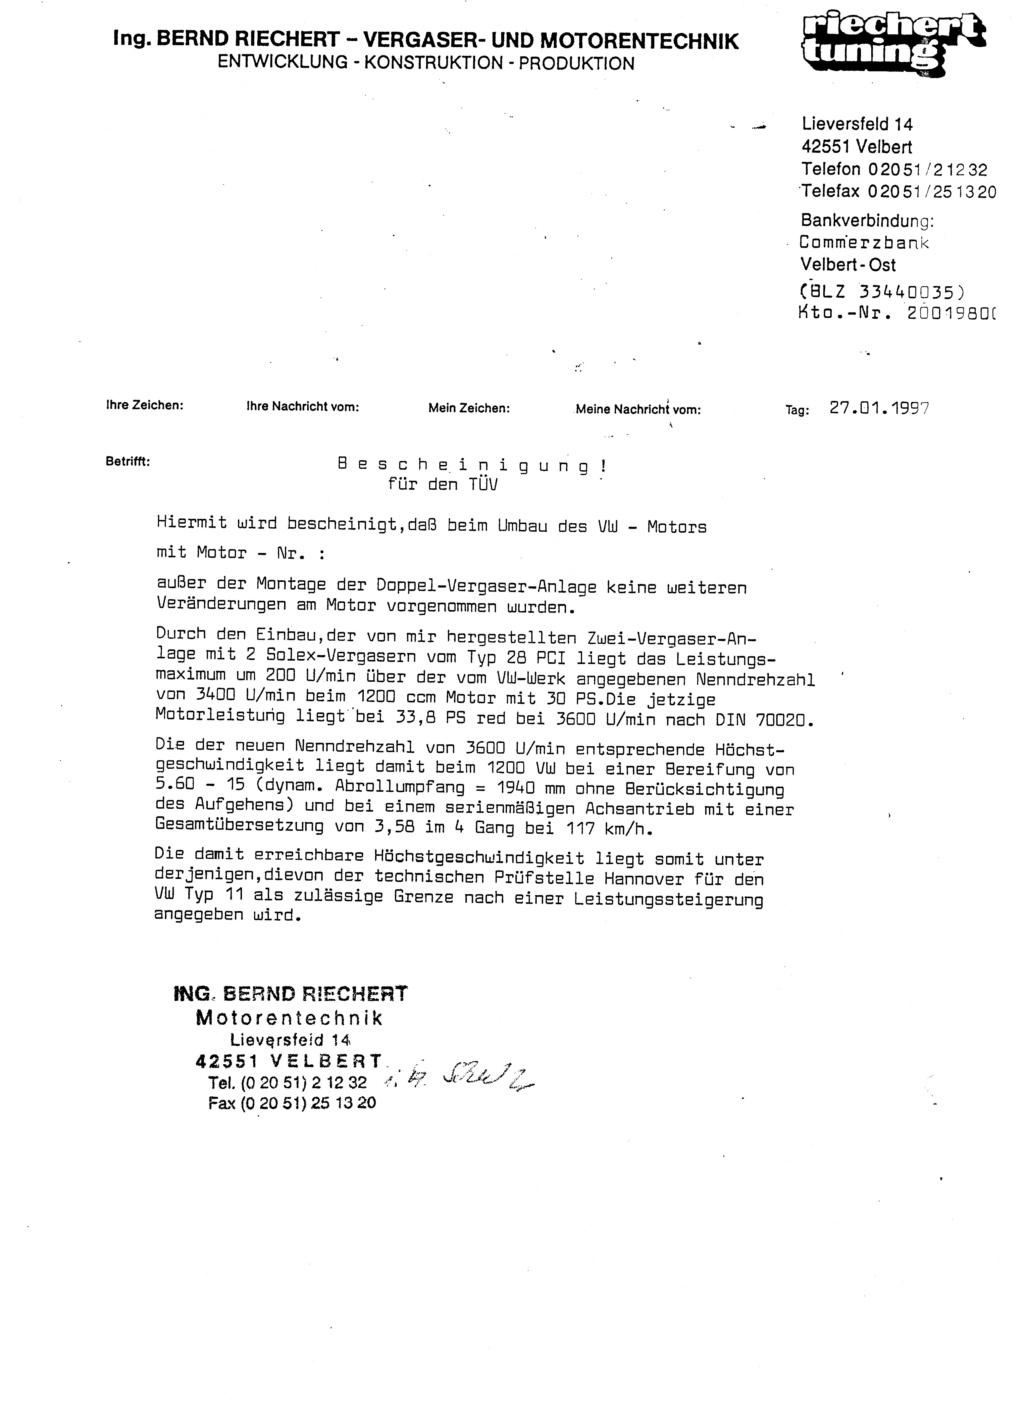 Documentation kit Riechert 00210